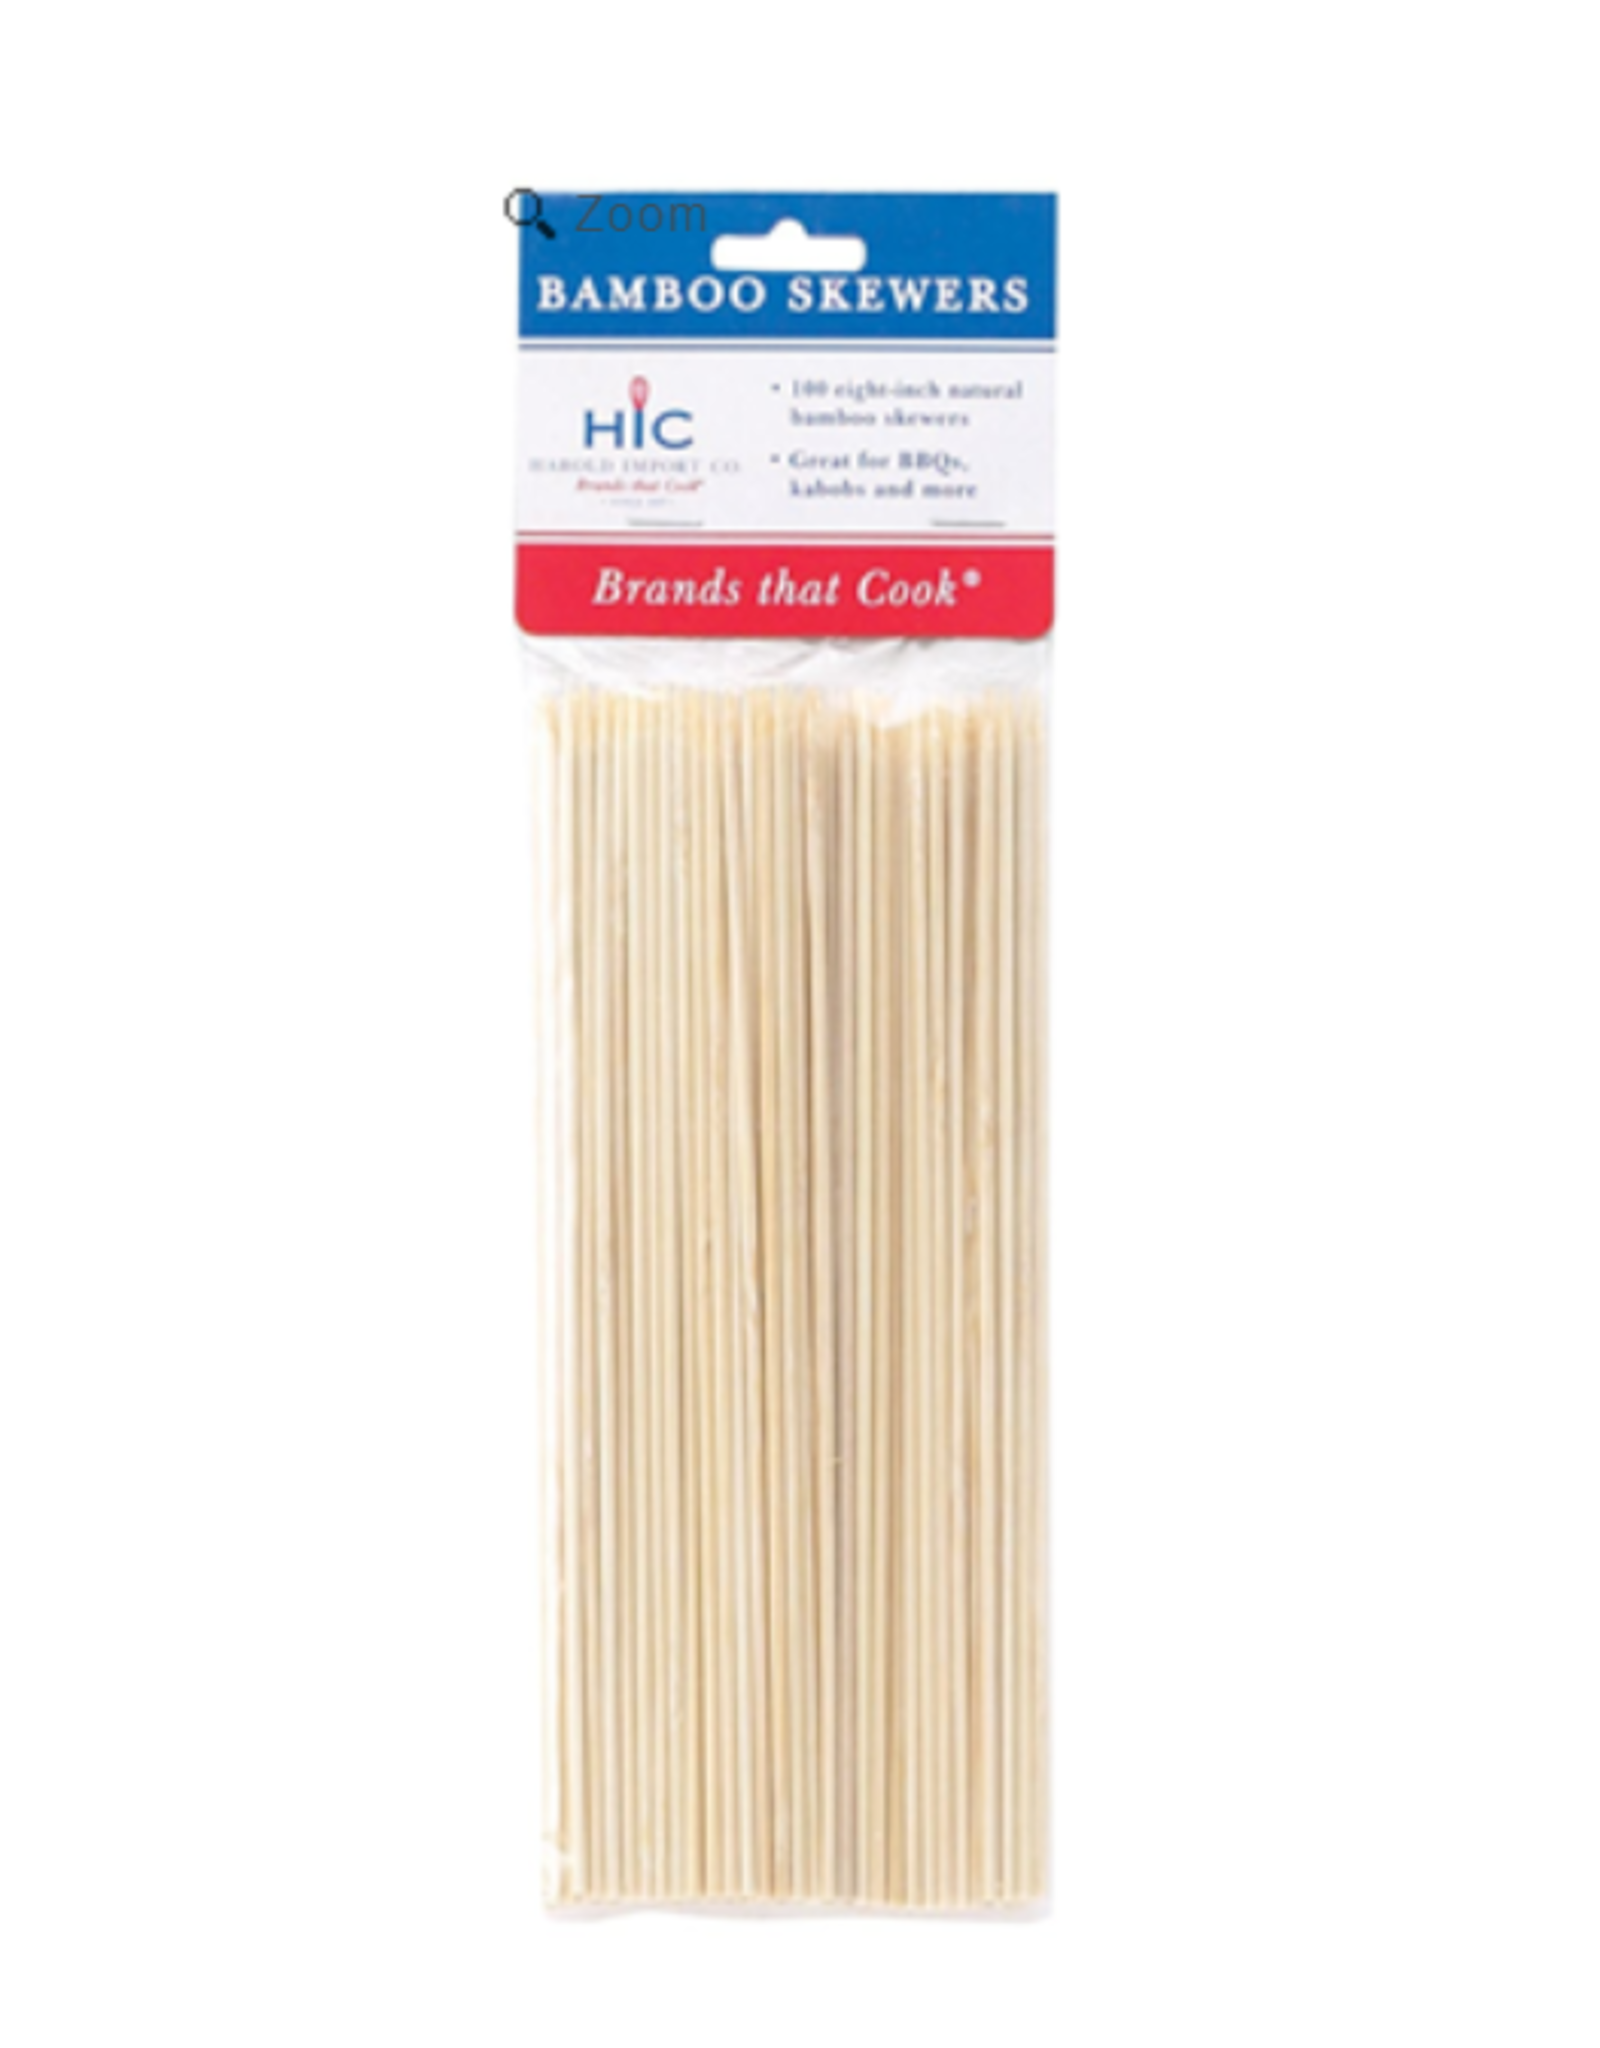 "Harold Import Company Inc. Bamboo Skewers, 8"""